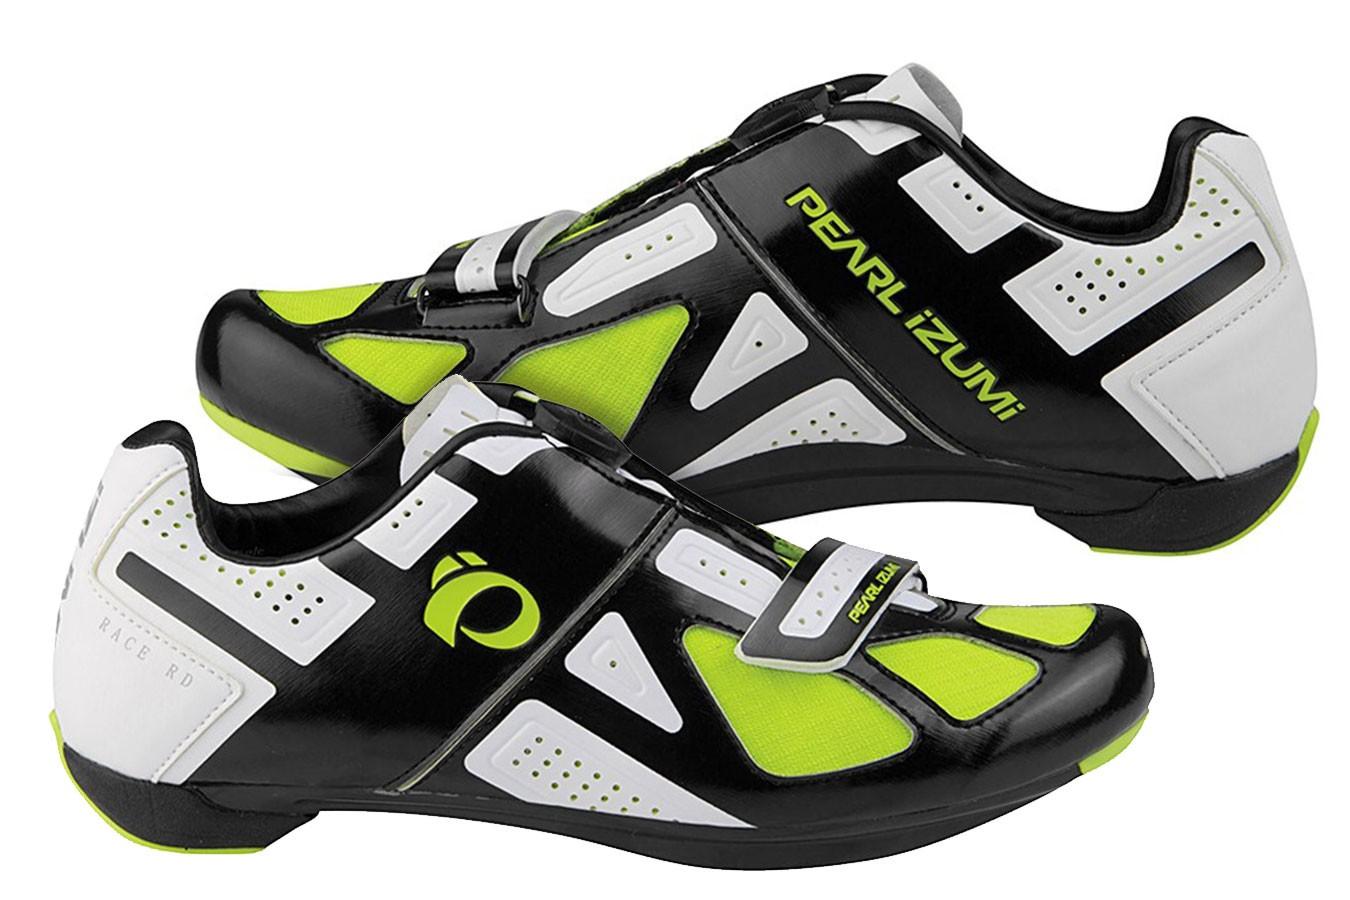 Sapatilha Road Race RD III (BPV) - Pearl iZUMi